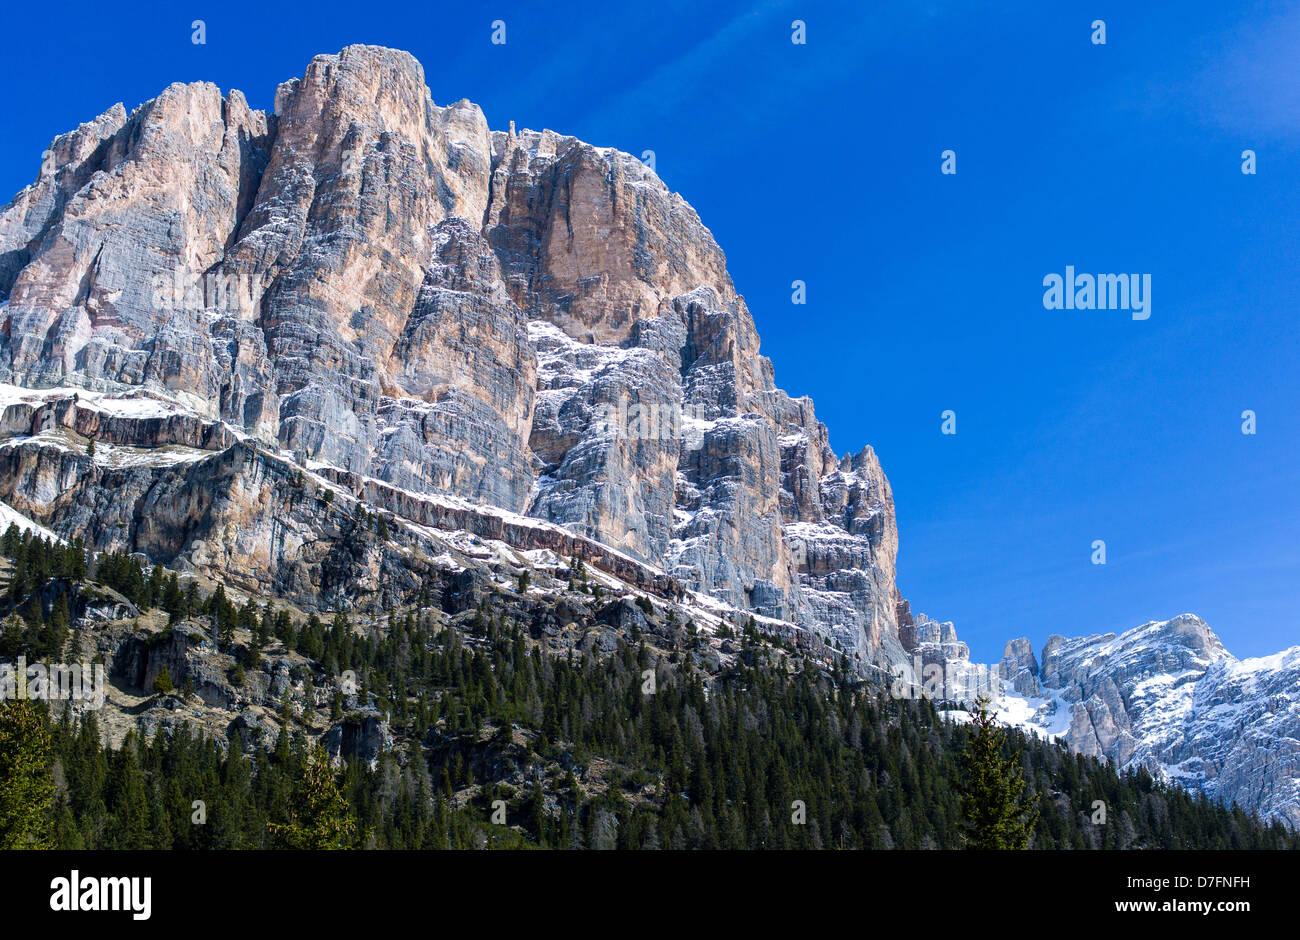 Italy Dolomites Veneto Cortina D'Ampezzo the Tofane De Rozes mountain - Stock Image